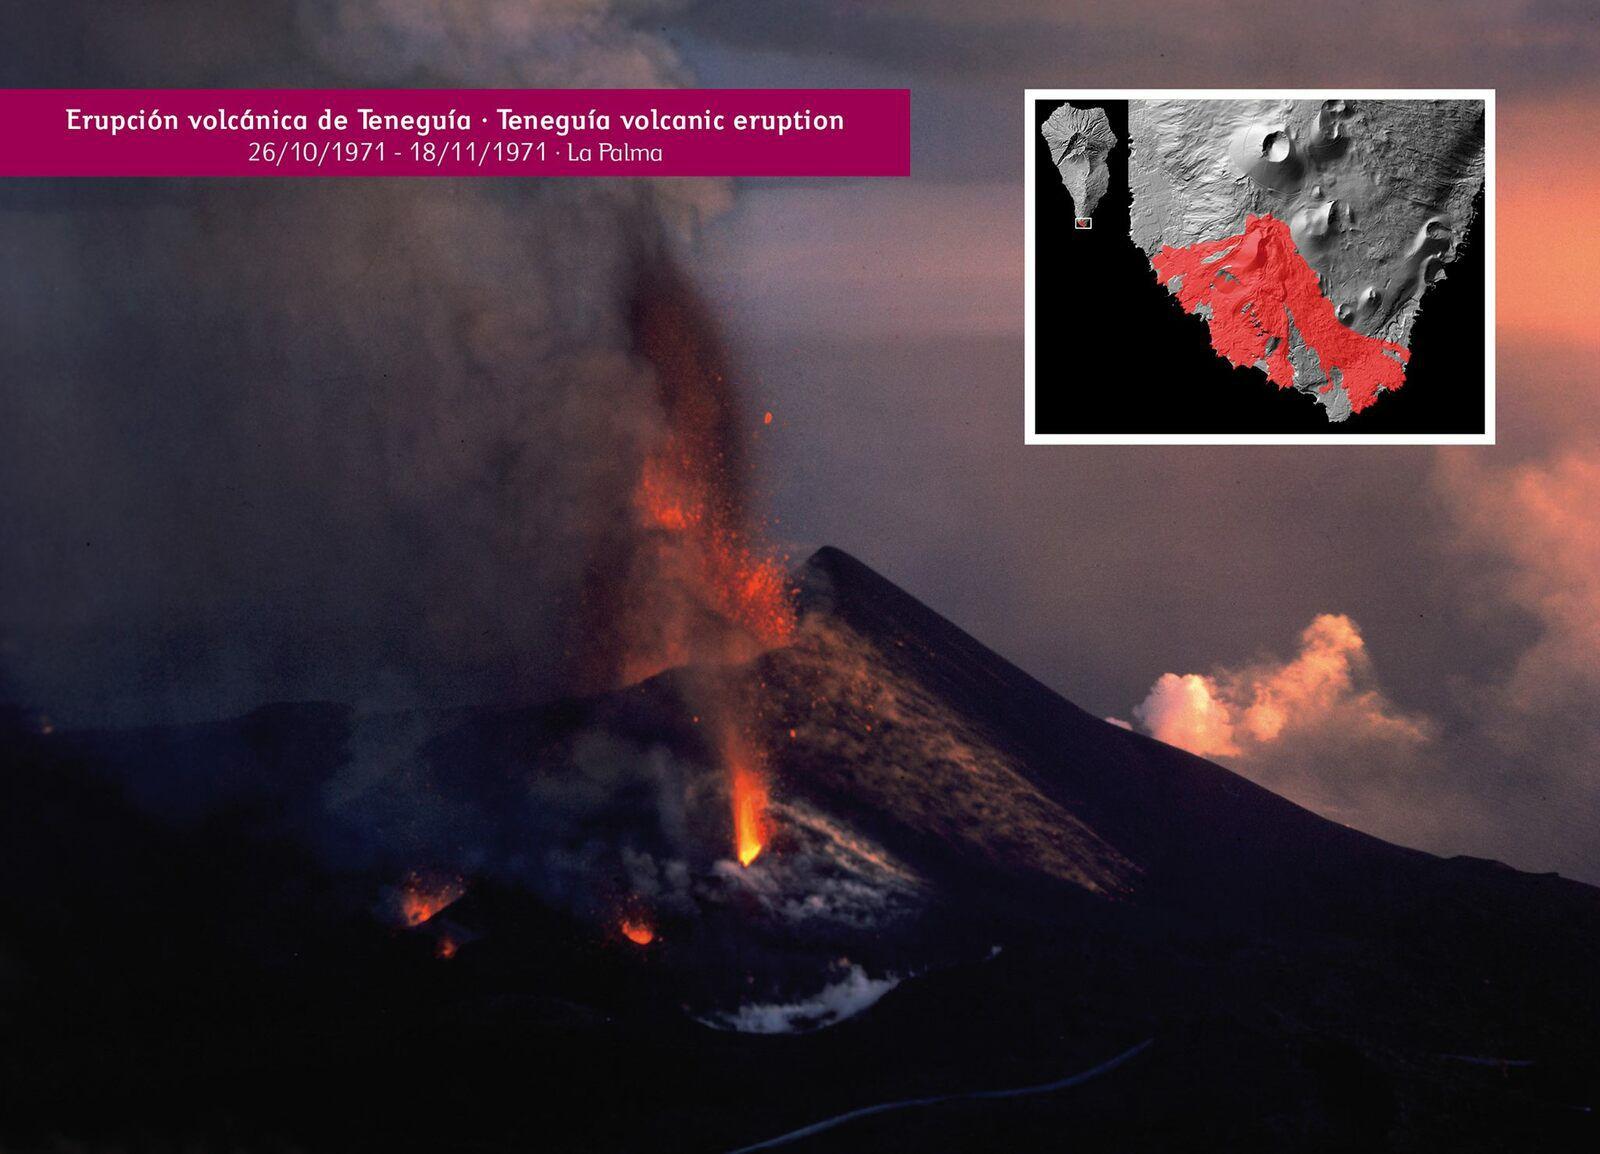 Teneguia volcano - eruption of 26.10.1971 - Archive doc via InVolcan